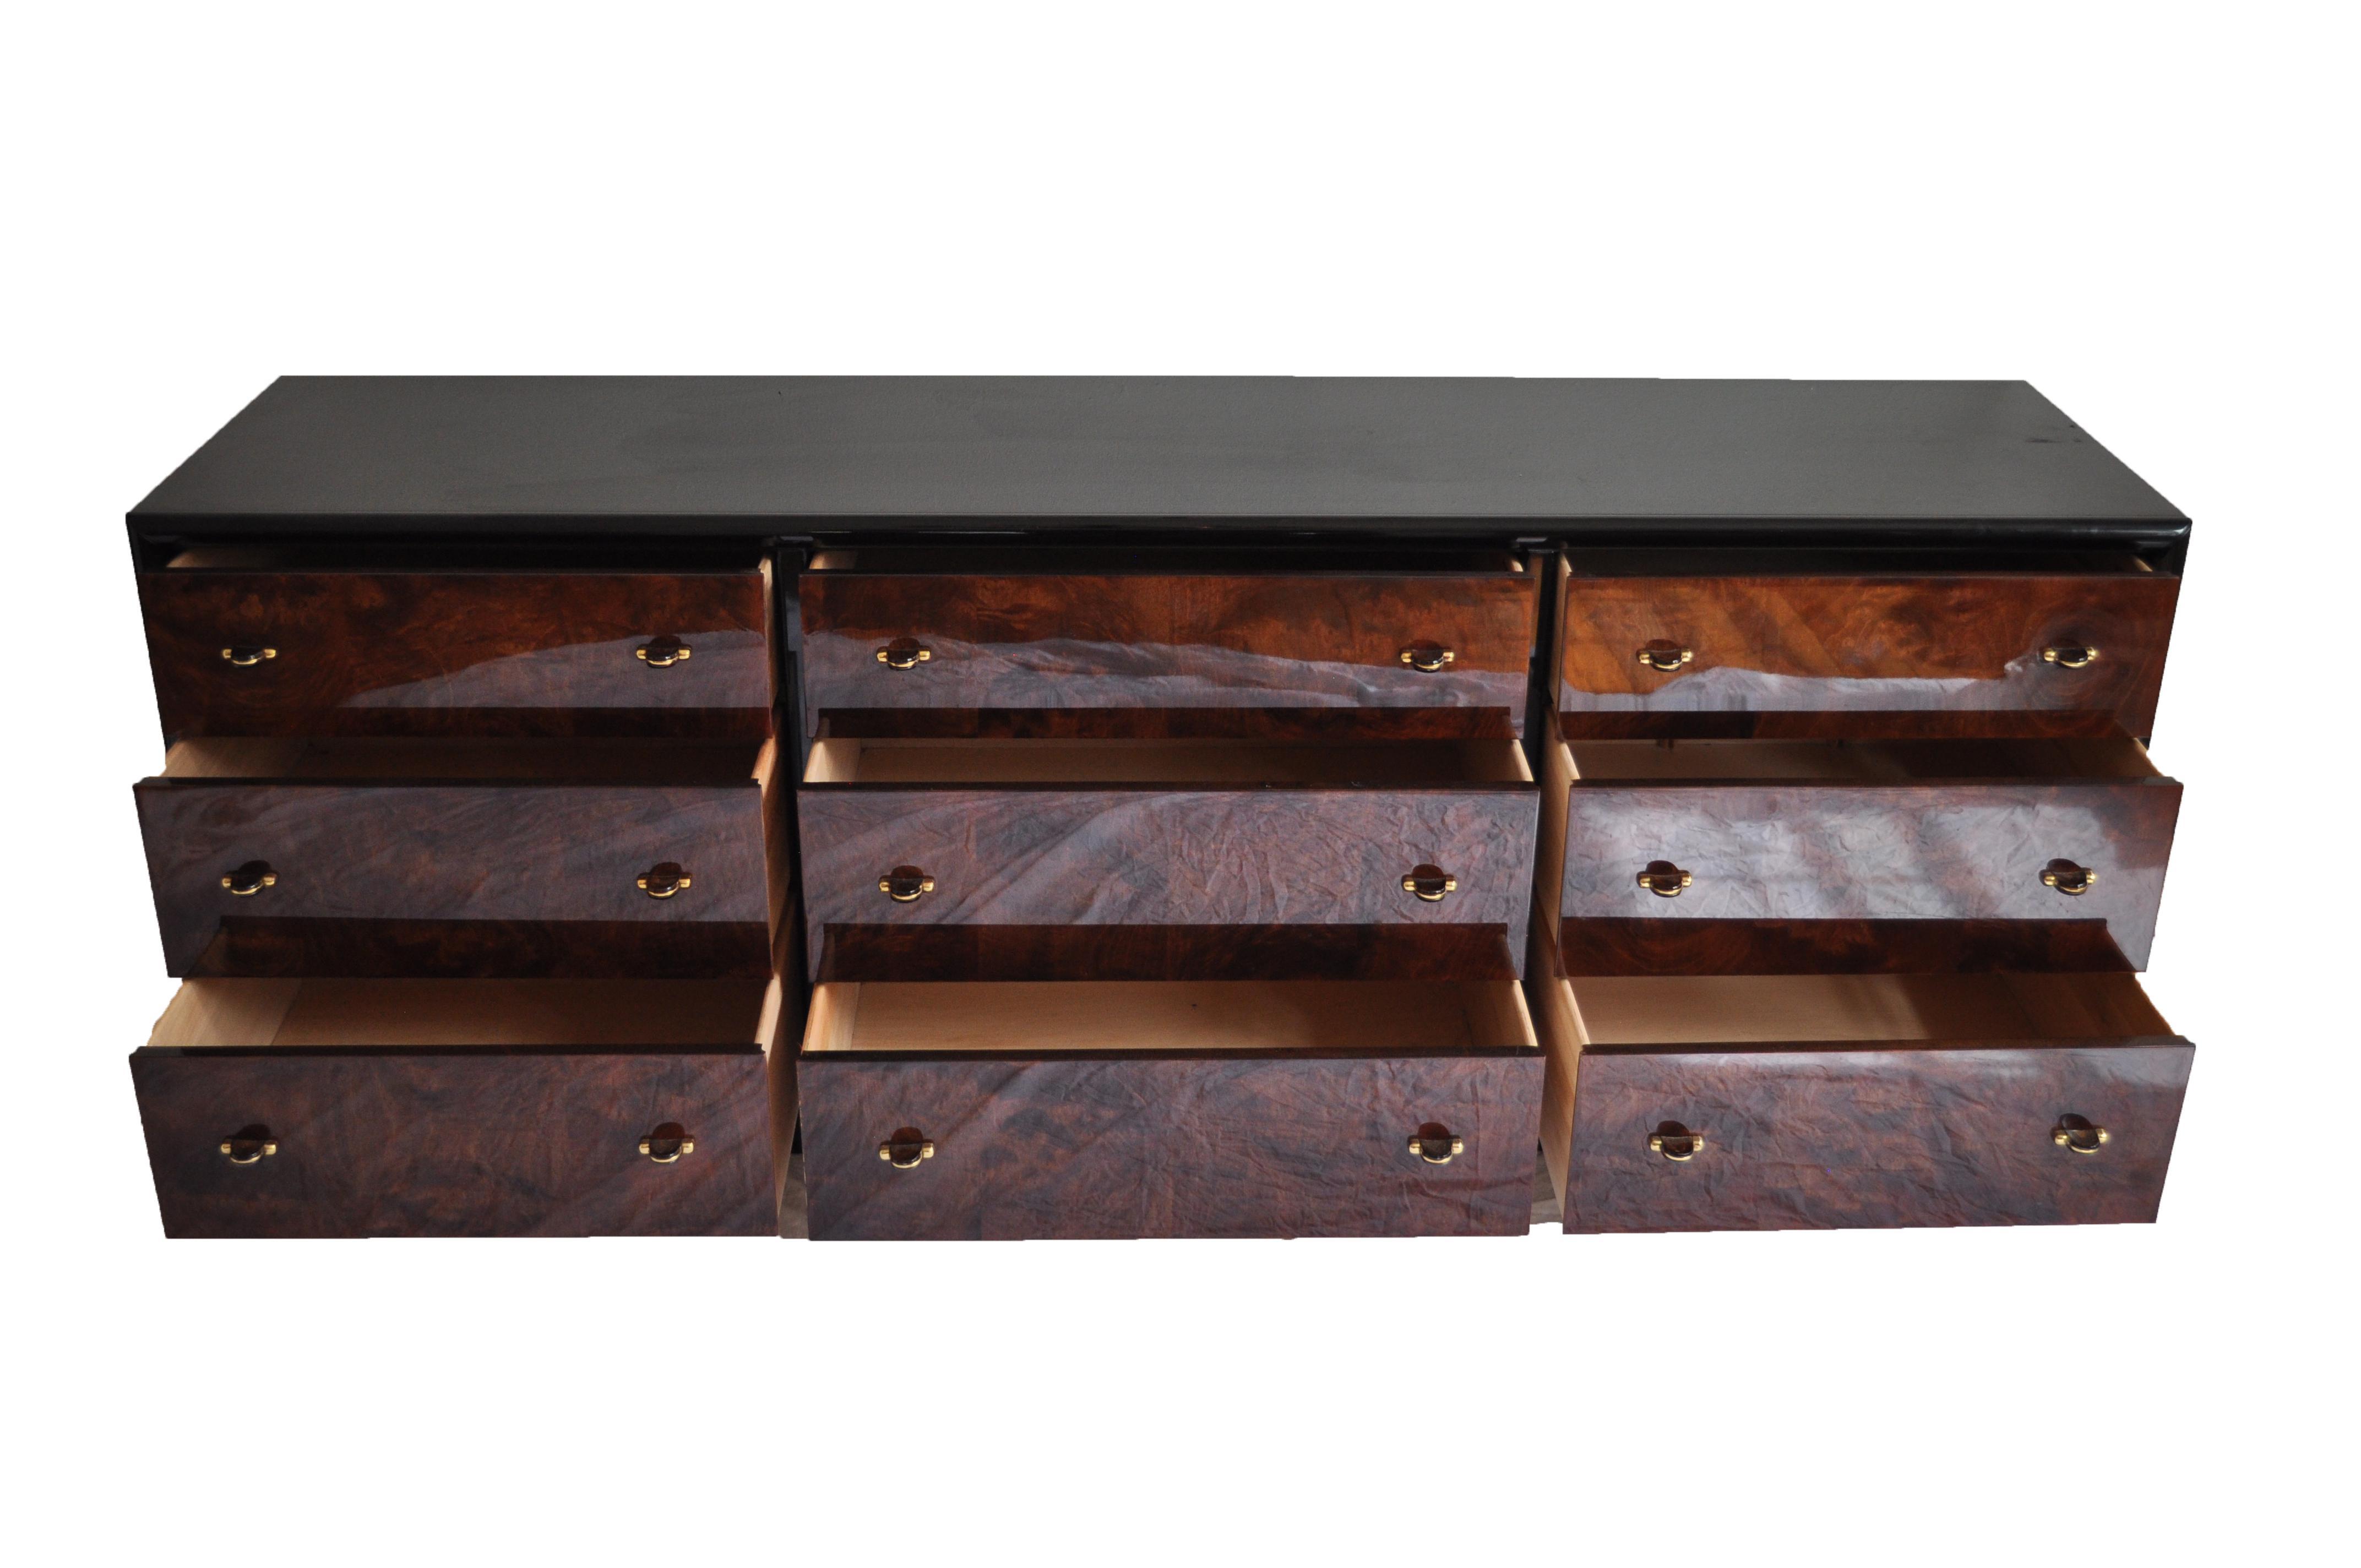 Henredon Black Lacquer U0026 Burled Wood 9 Drawer Chest Of Drawers   Image 3 ...